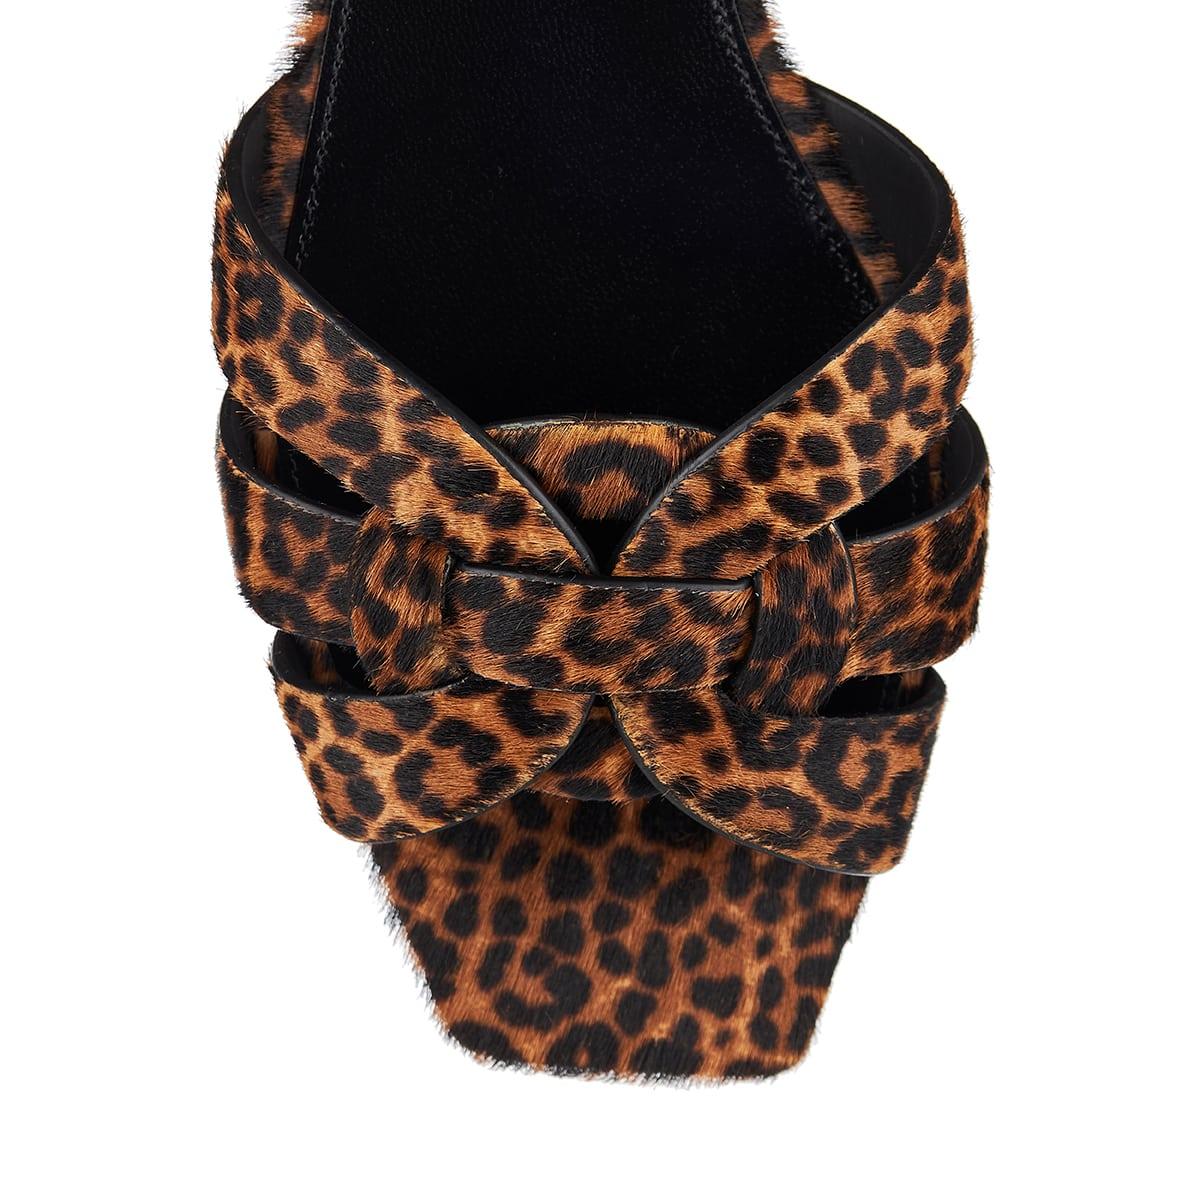 Tribute leopard calf-hair slides